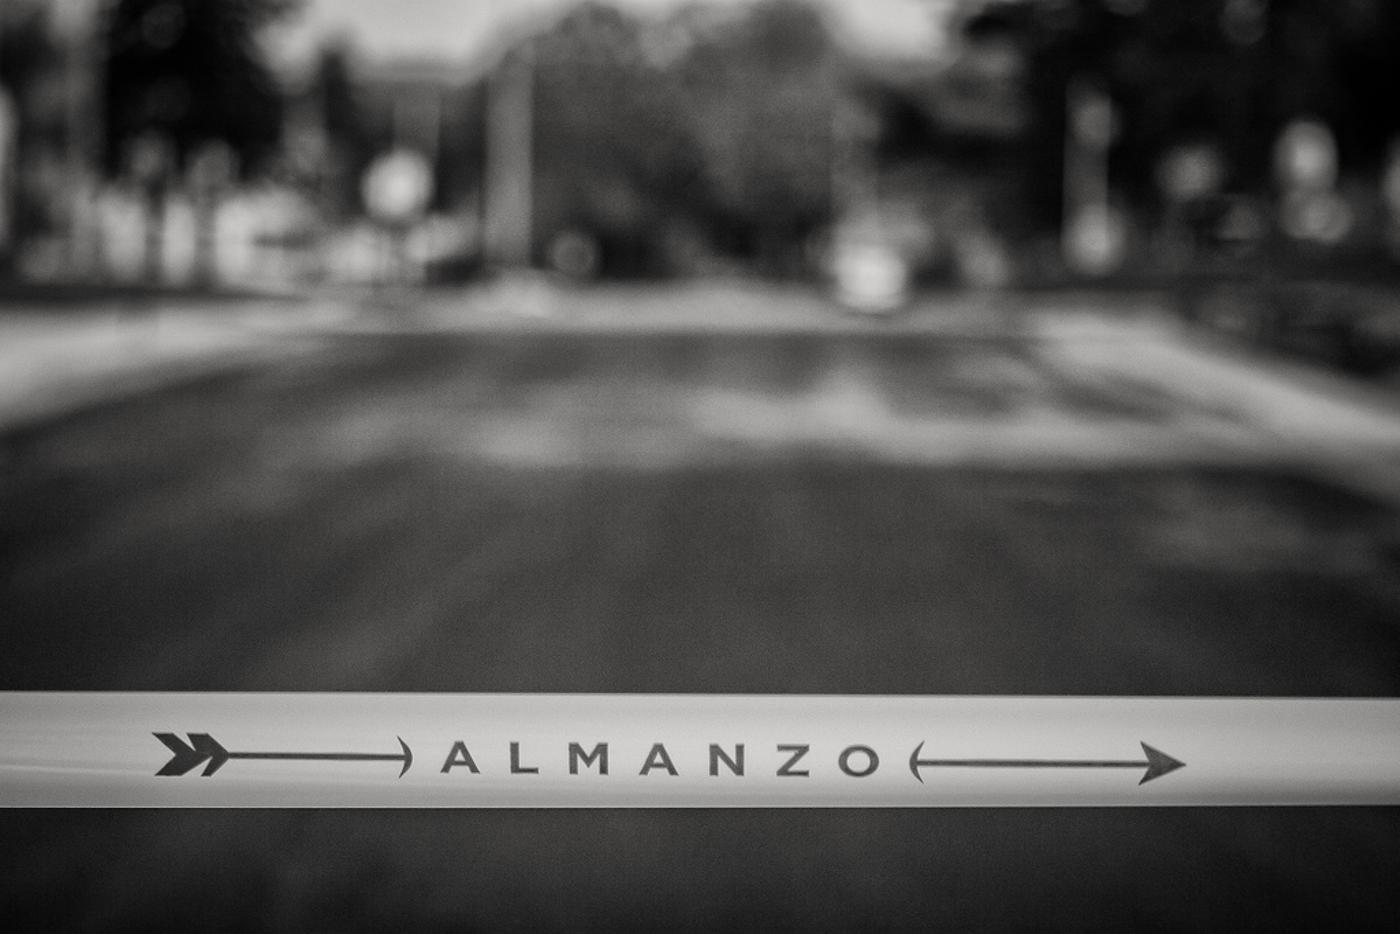 Craig Lindner's Almanzo 100 Photos